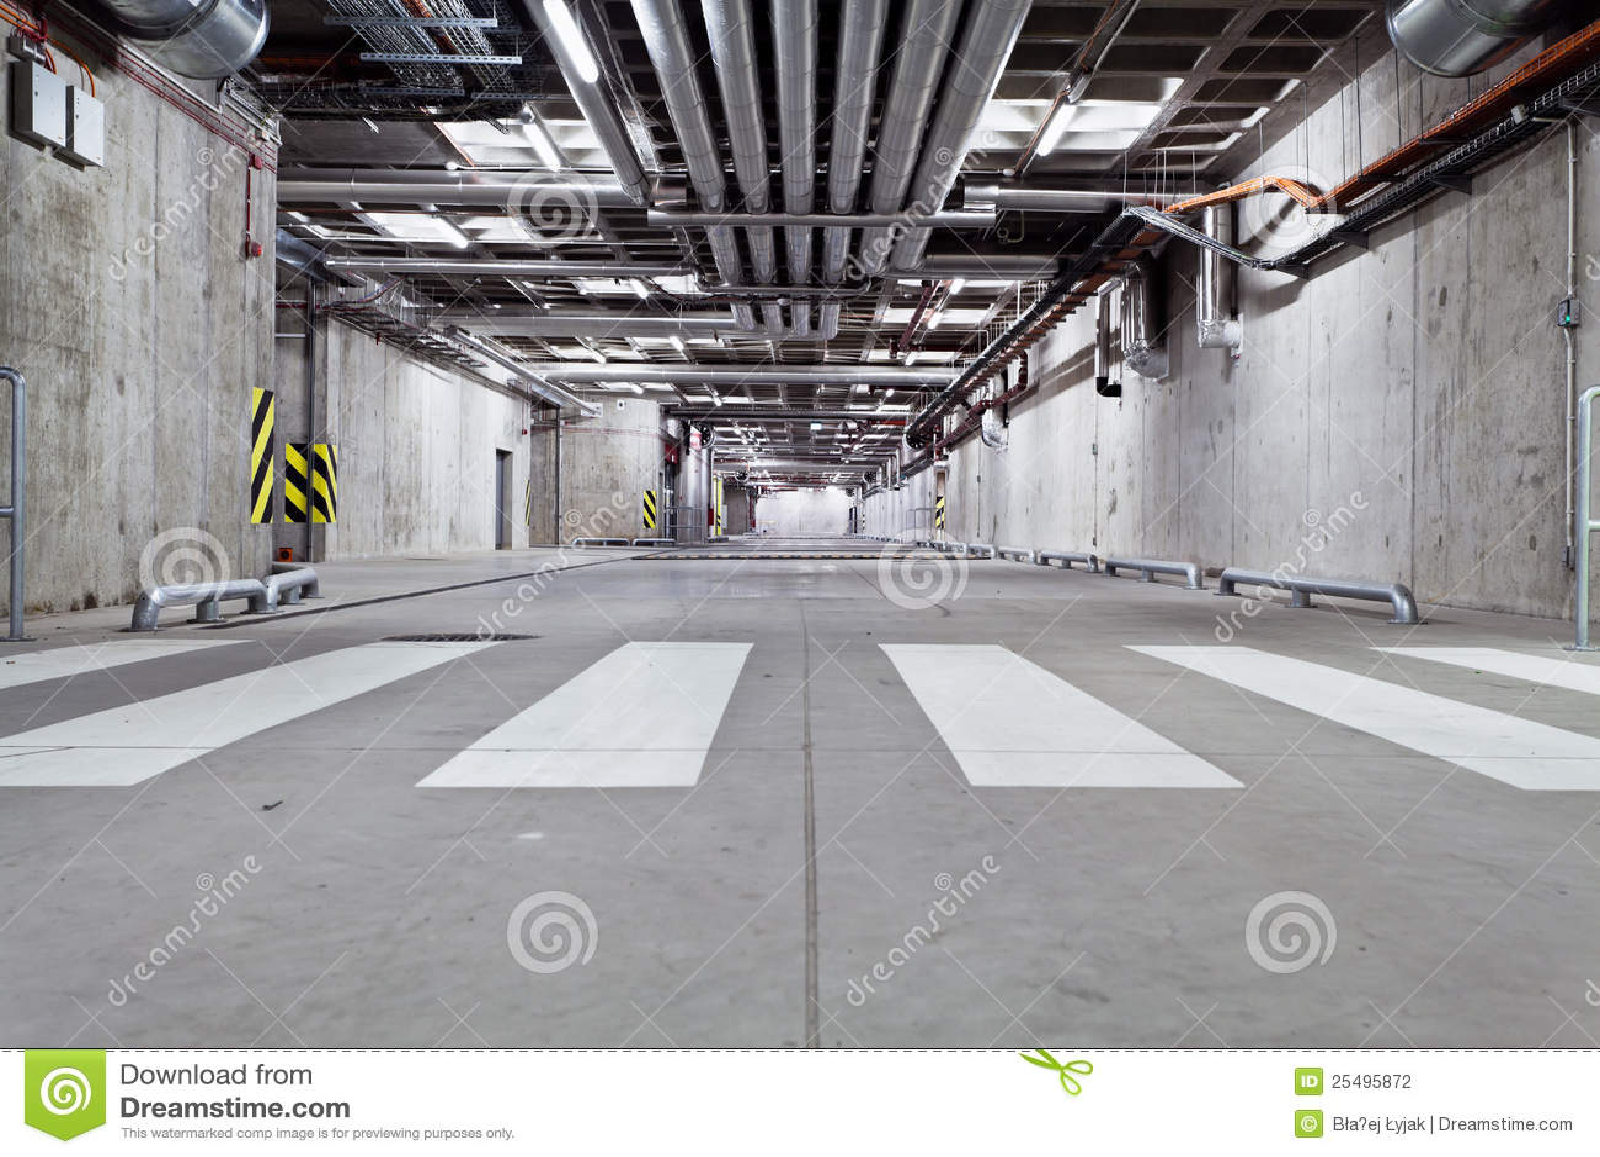 Concrete Underground Garage : Concrete underground road stock photo image of